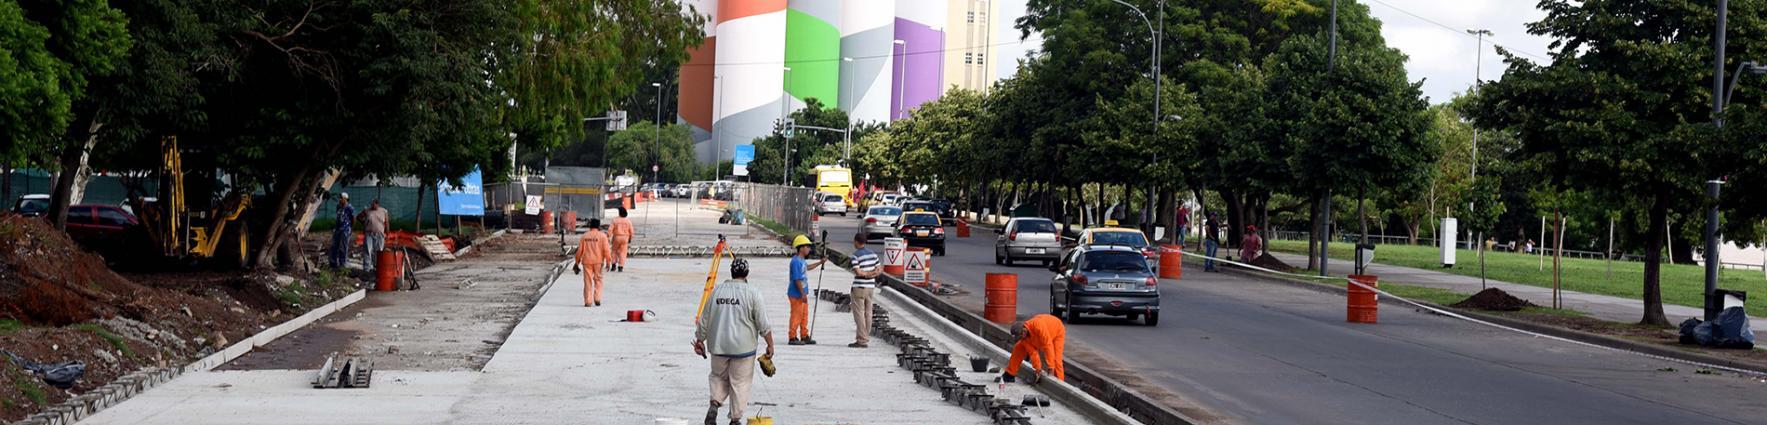 Avance de obras de la avenida de la Costa